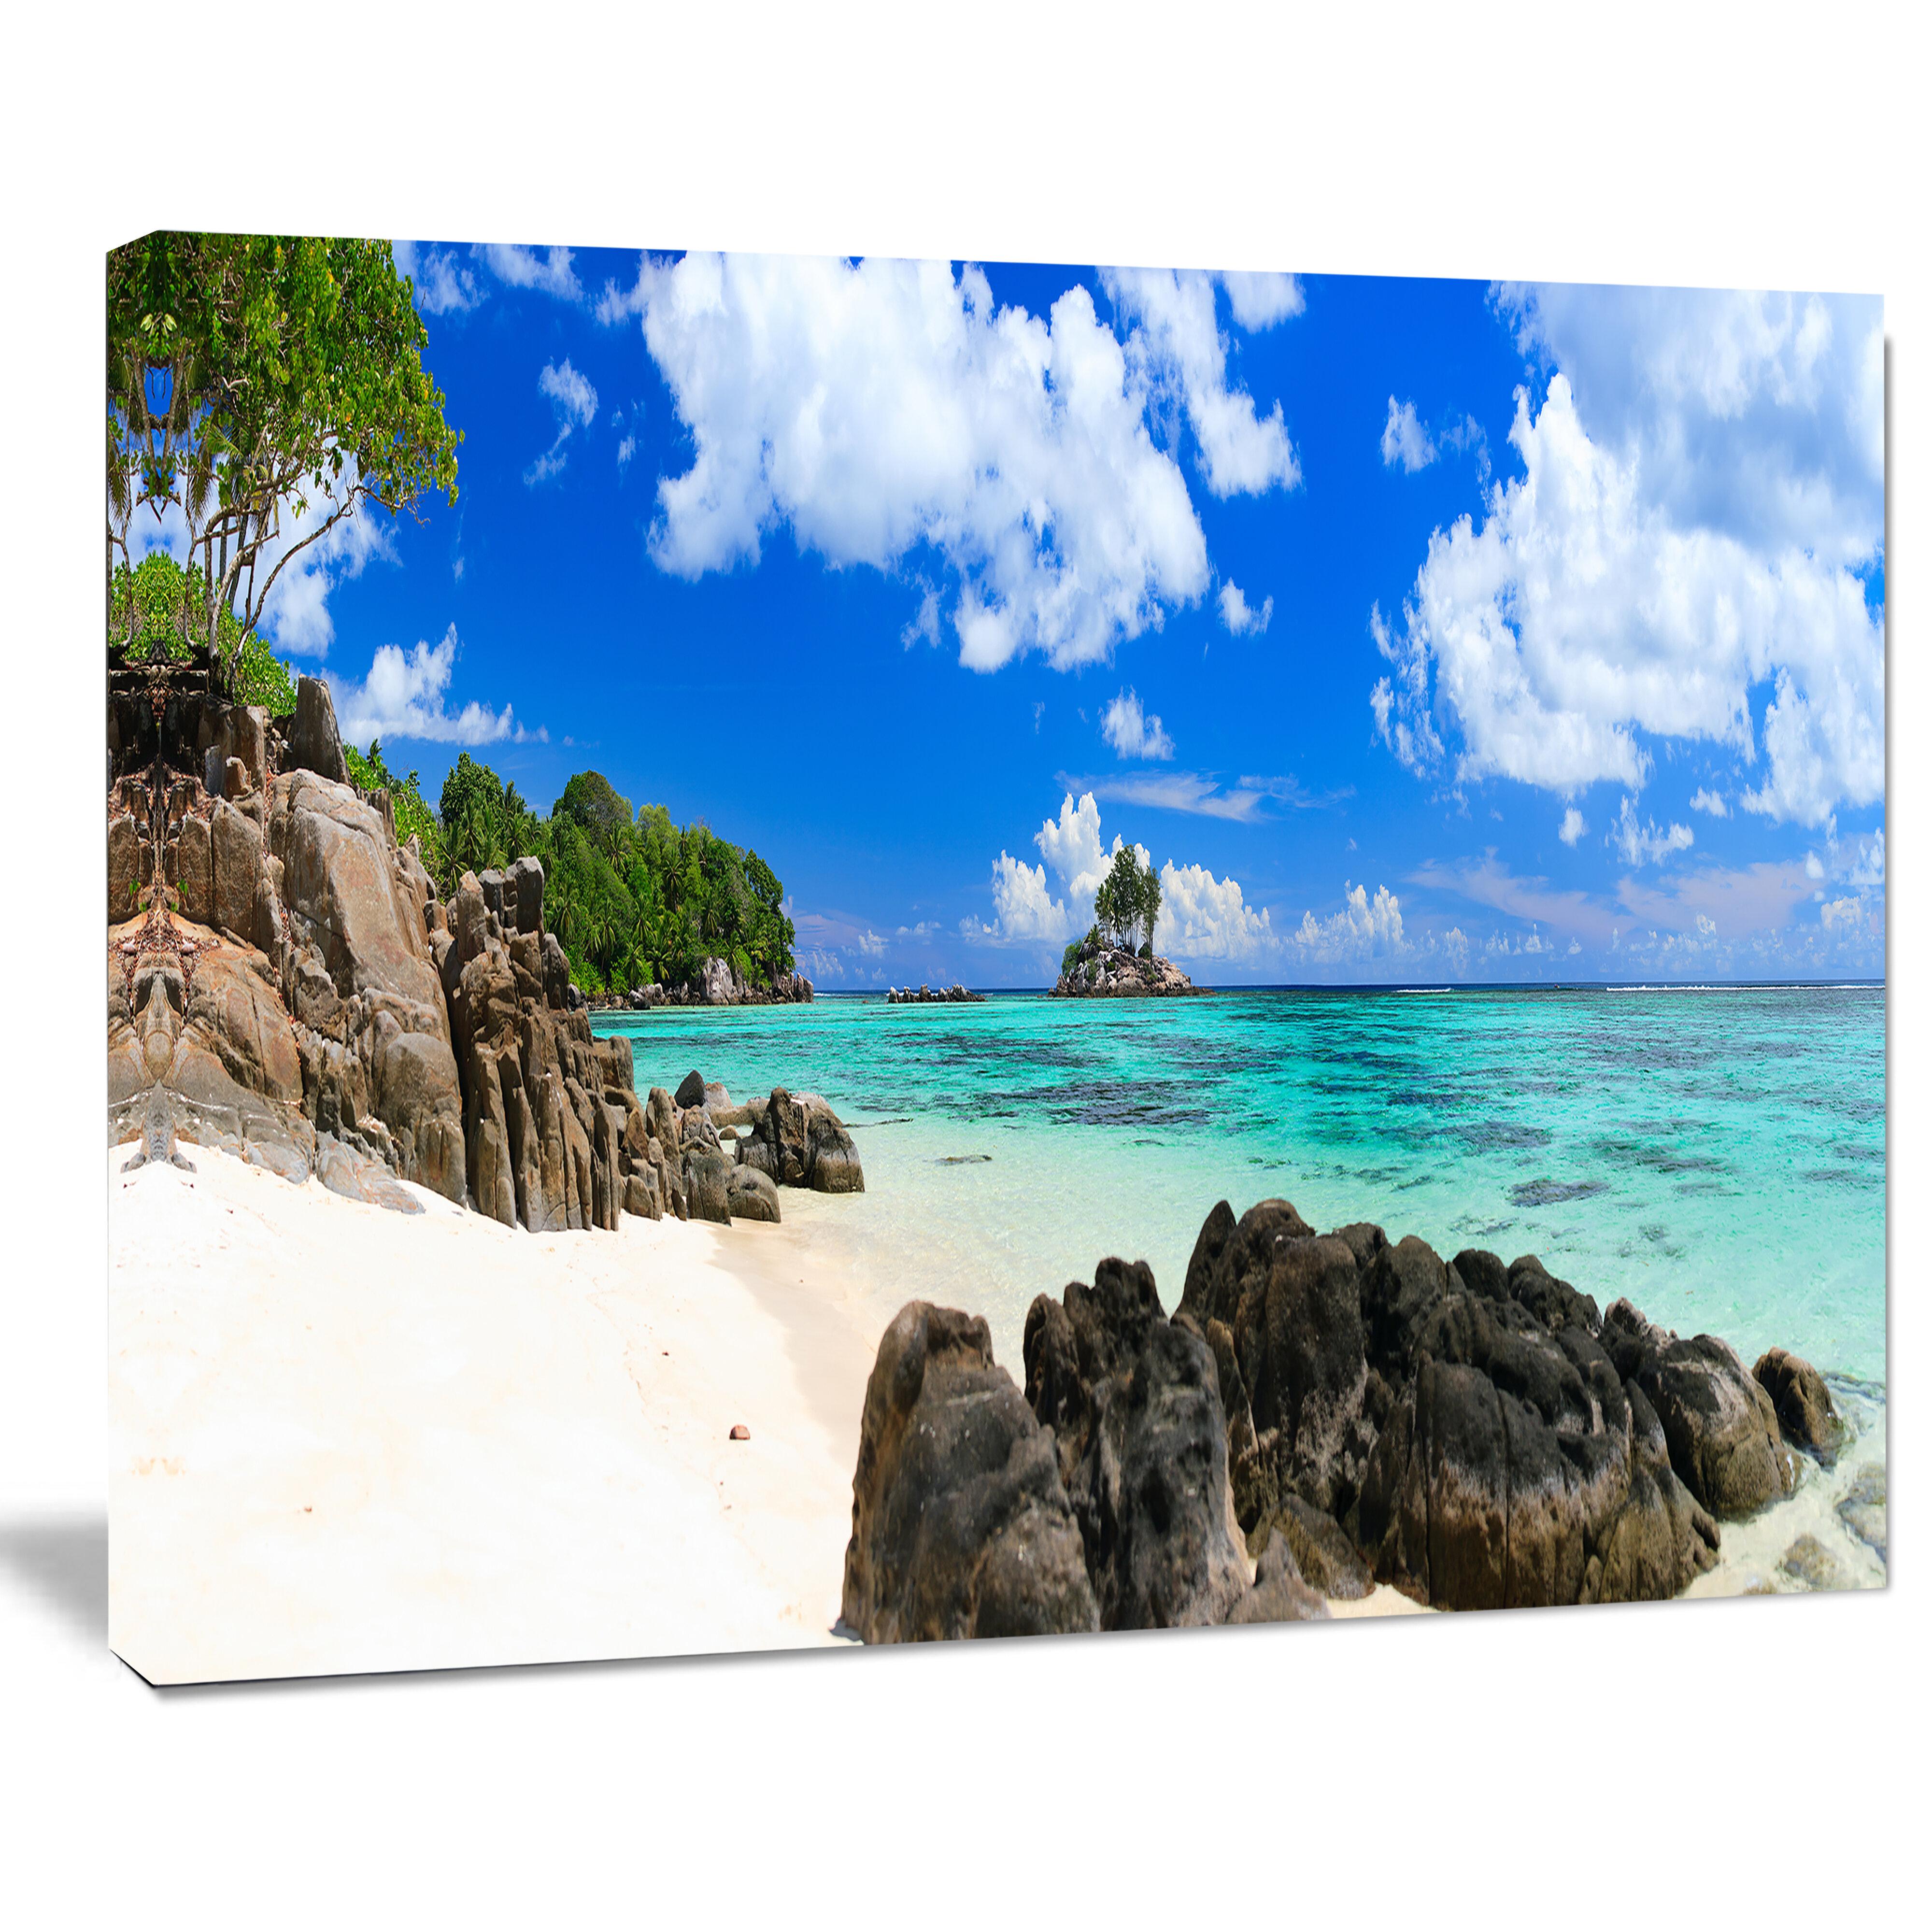 Seychelles Beach: DesignArt 'Ideal Beach In Seychelles' Photographic Print